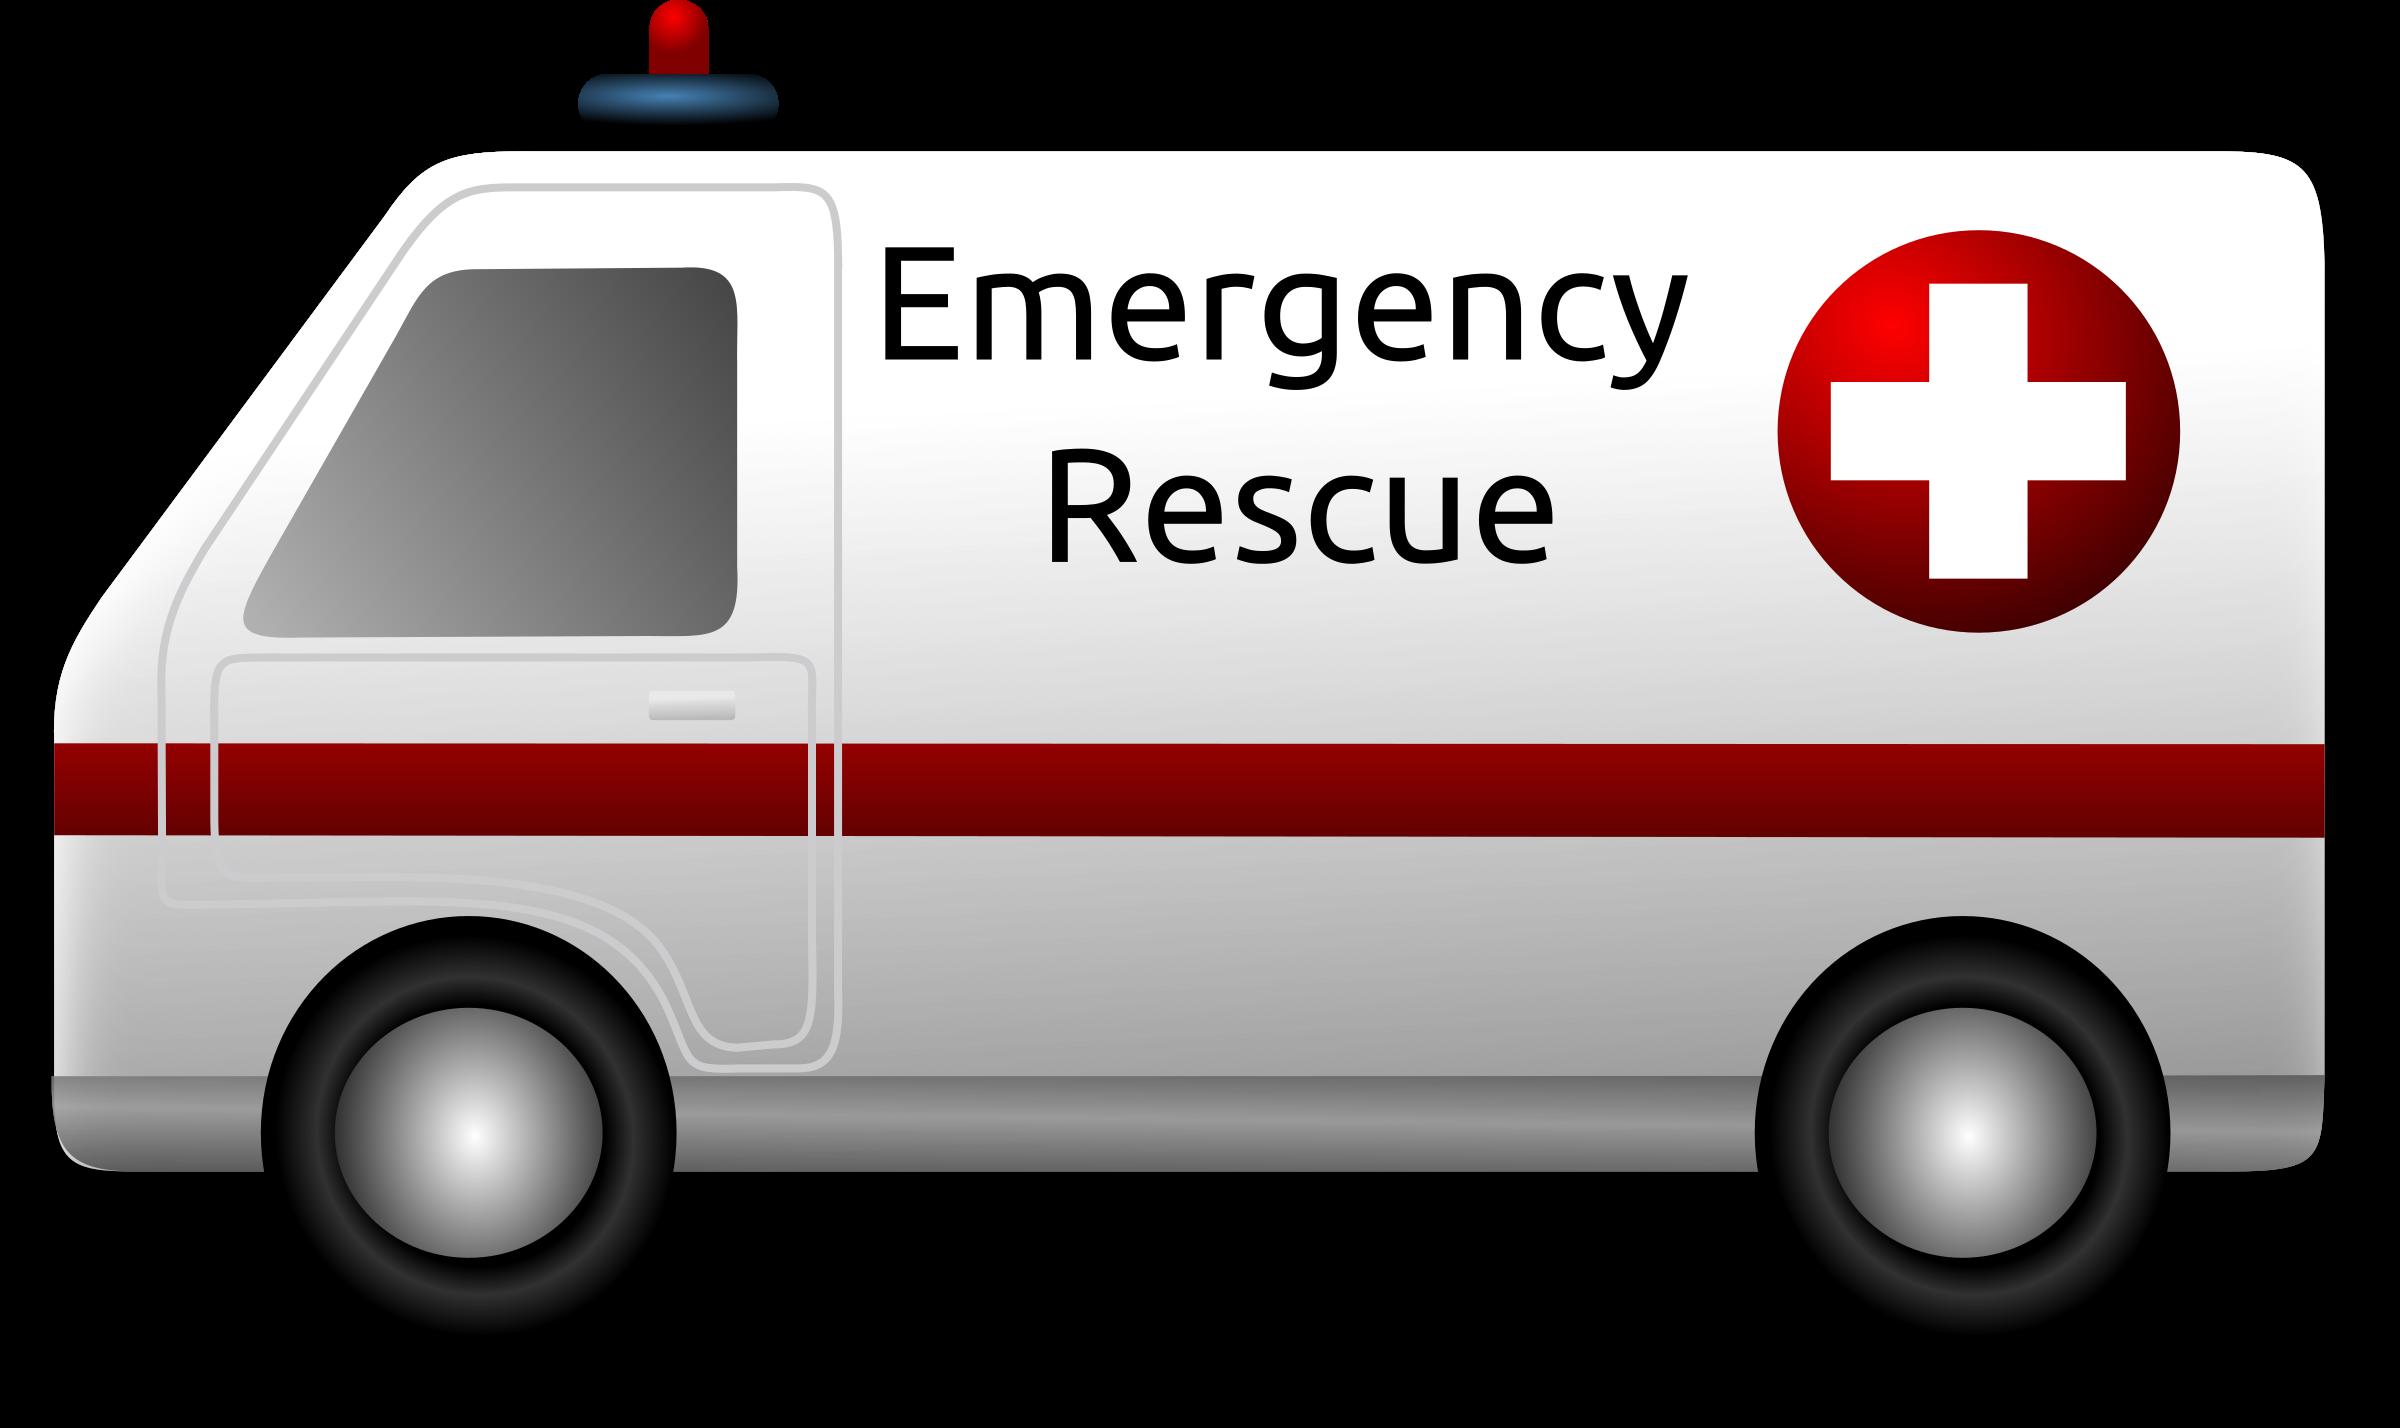 Ambulance Clipart & Ambulance Clip Art Images.